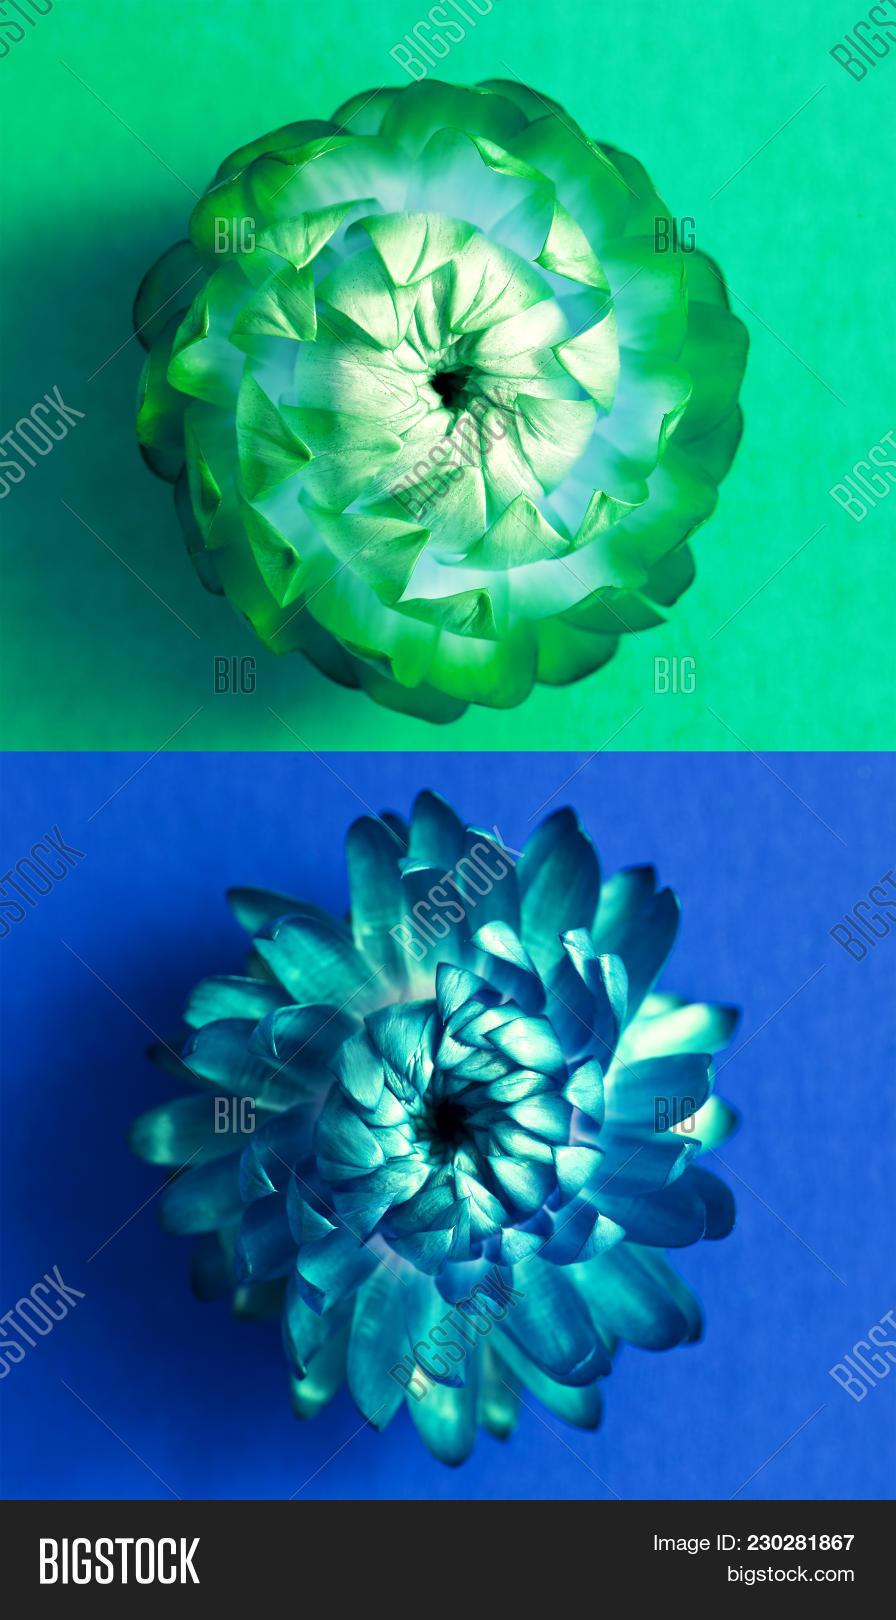 Two Blossoms Of Everlasting Flowers Strawflowers Green Flower